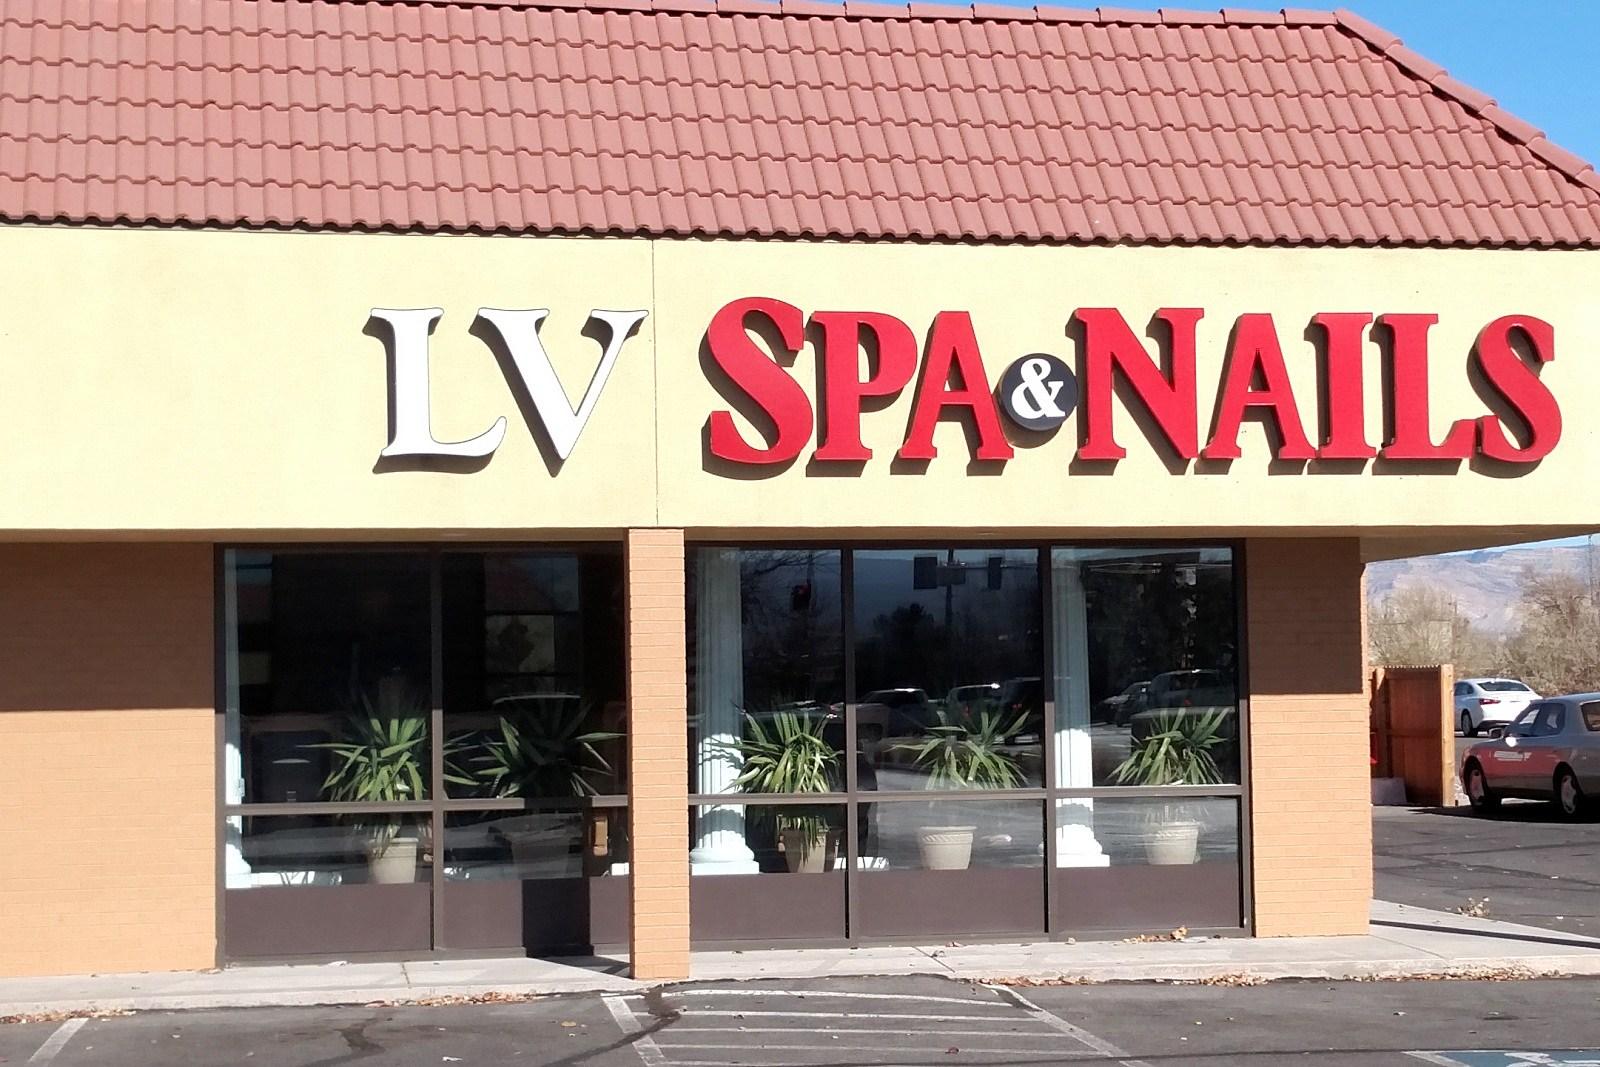 LV Spa and Nails